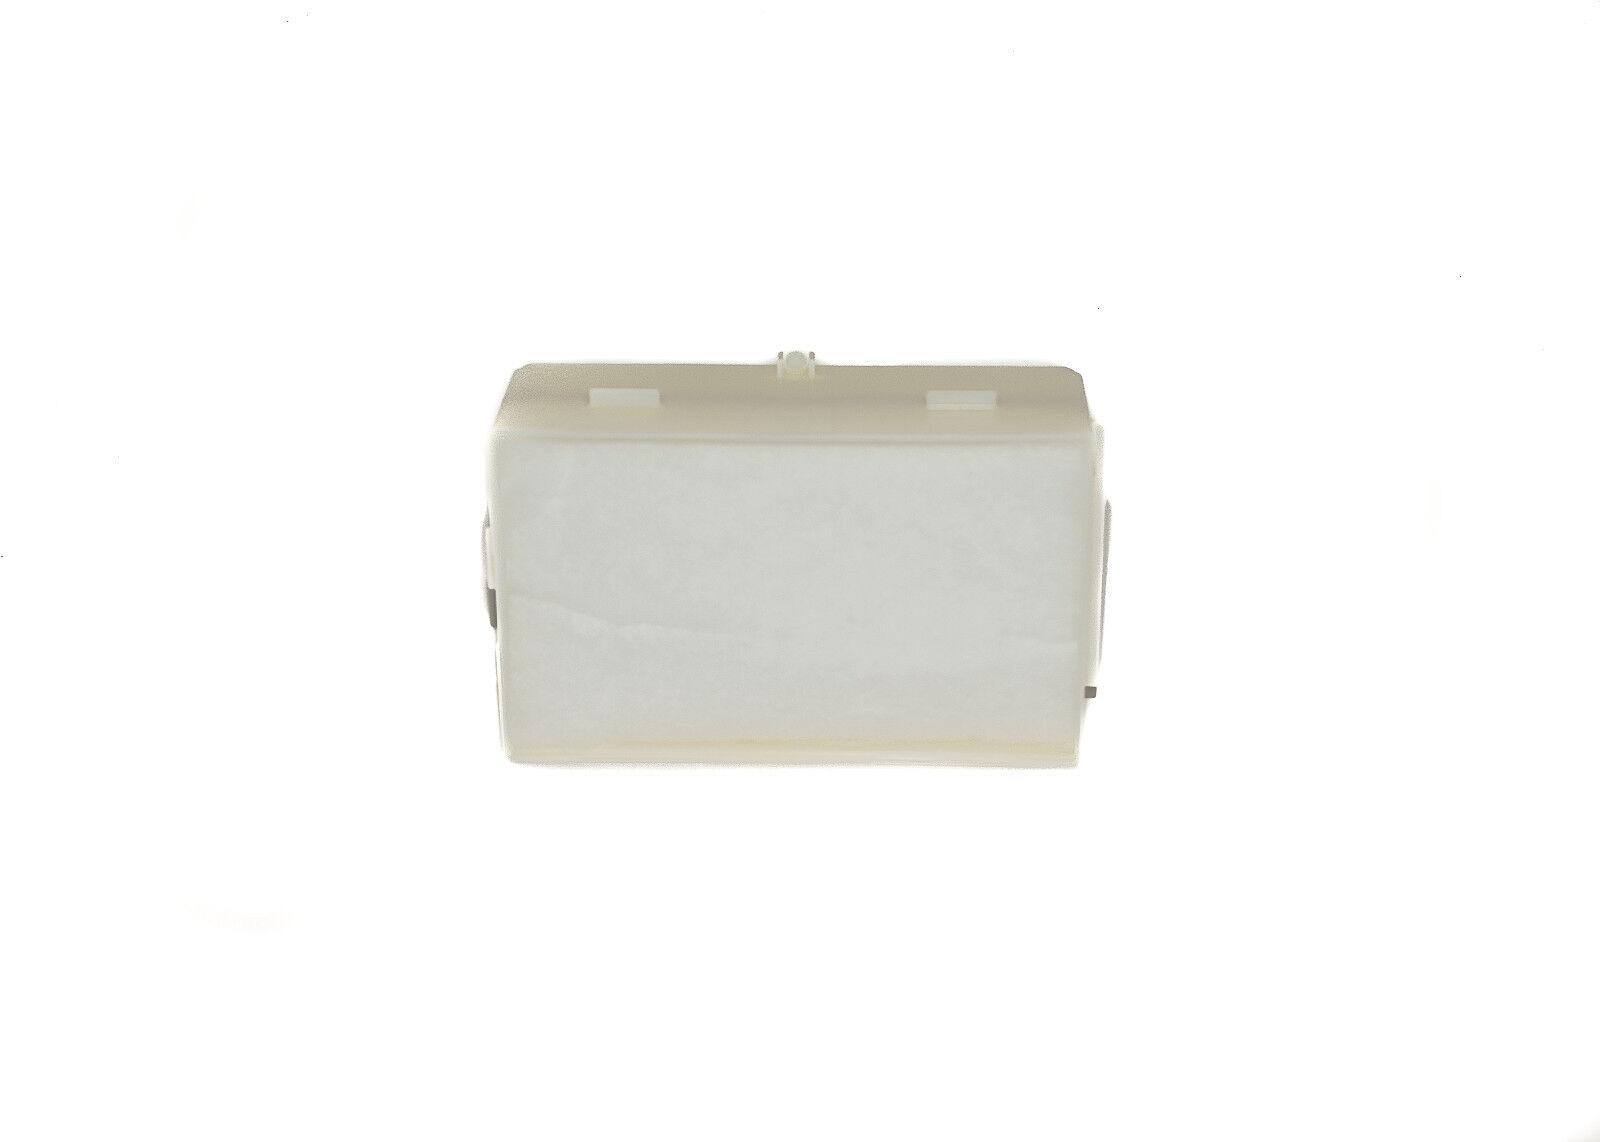 Dyson Airblade Ab03 Hand Dryer: Genuine Dyson Airblade Hand Dryer HEPA Filter. AB01, AB03